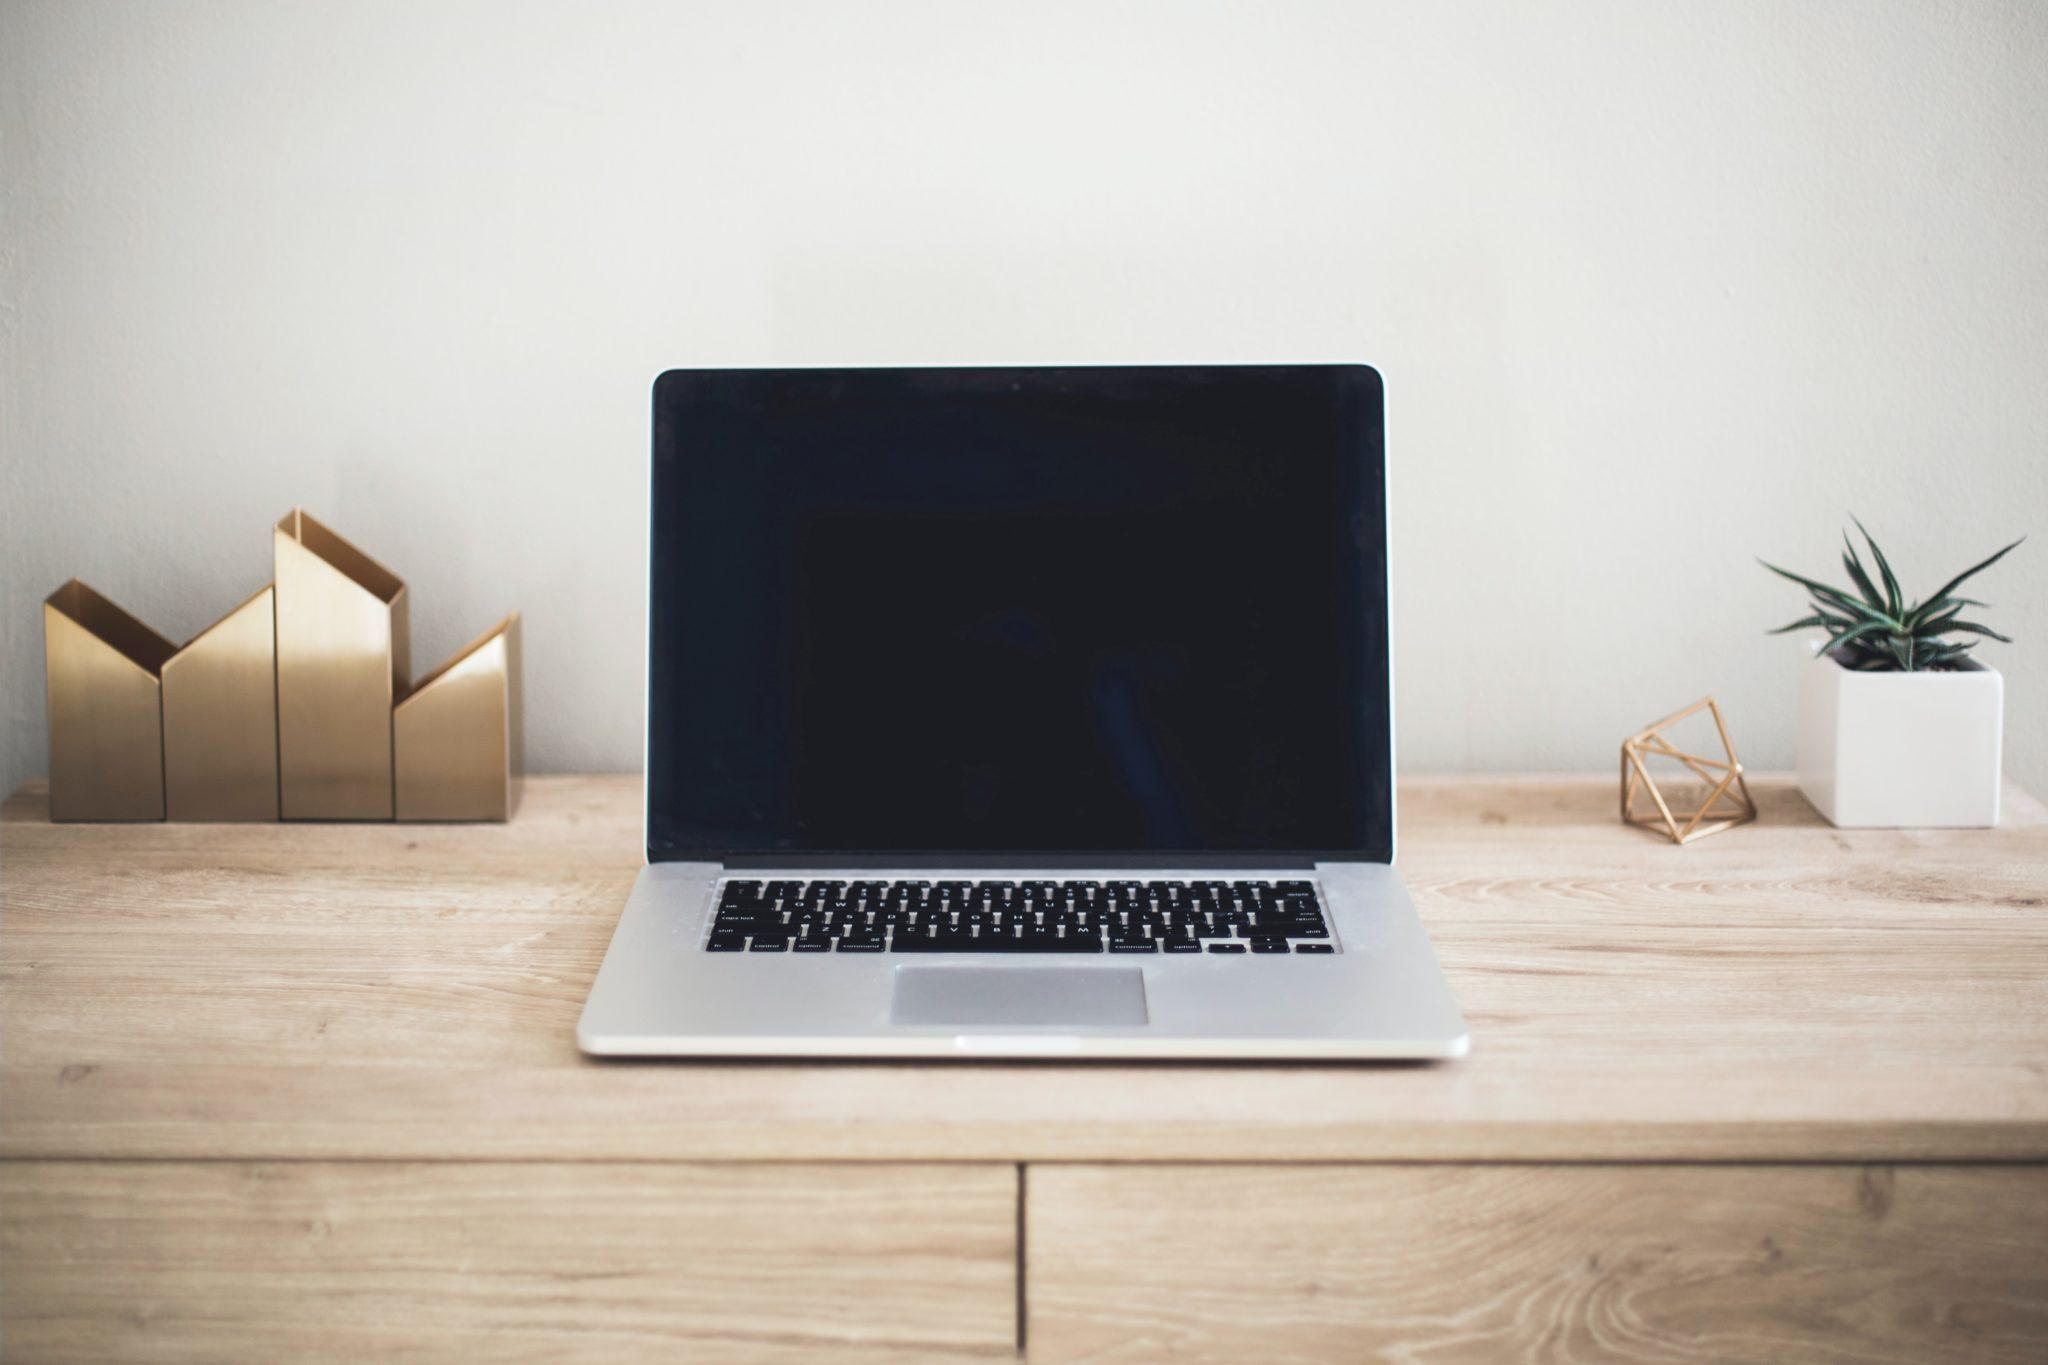 Fungsi cPanel Dalam Penggunaan Website